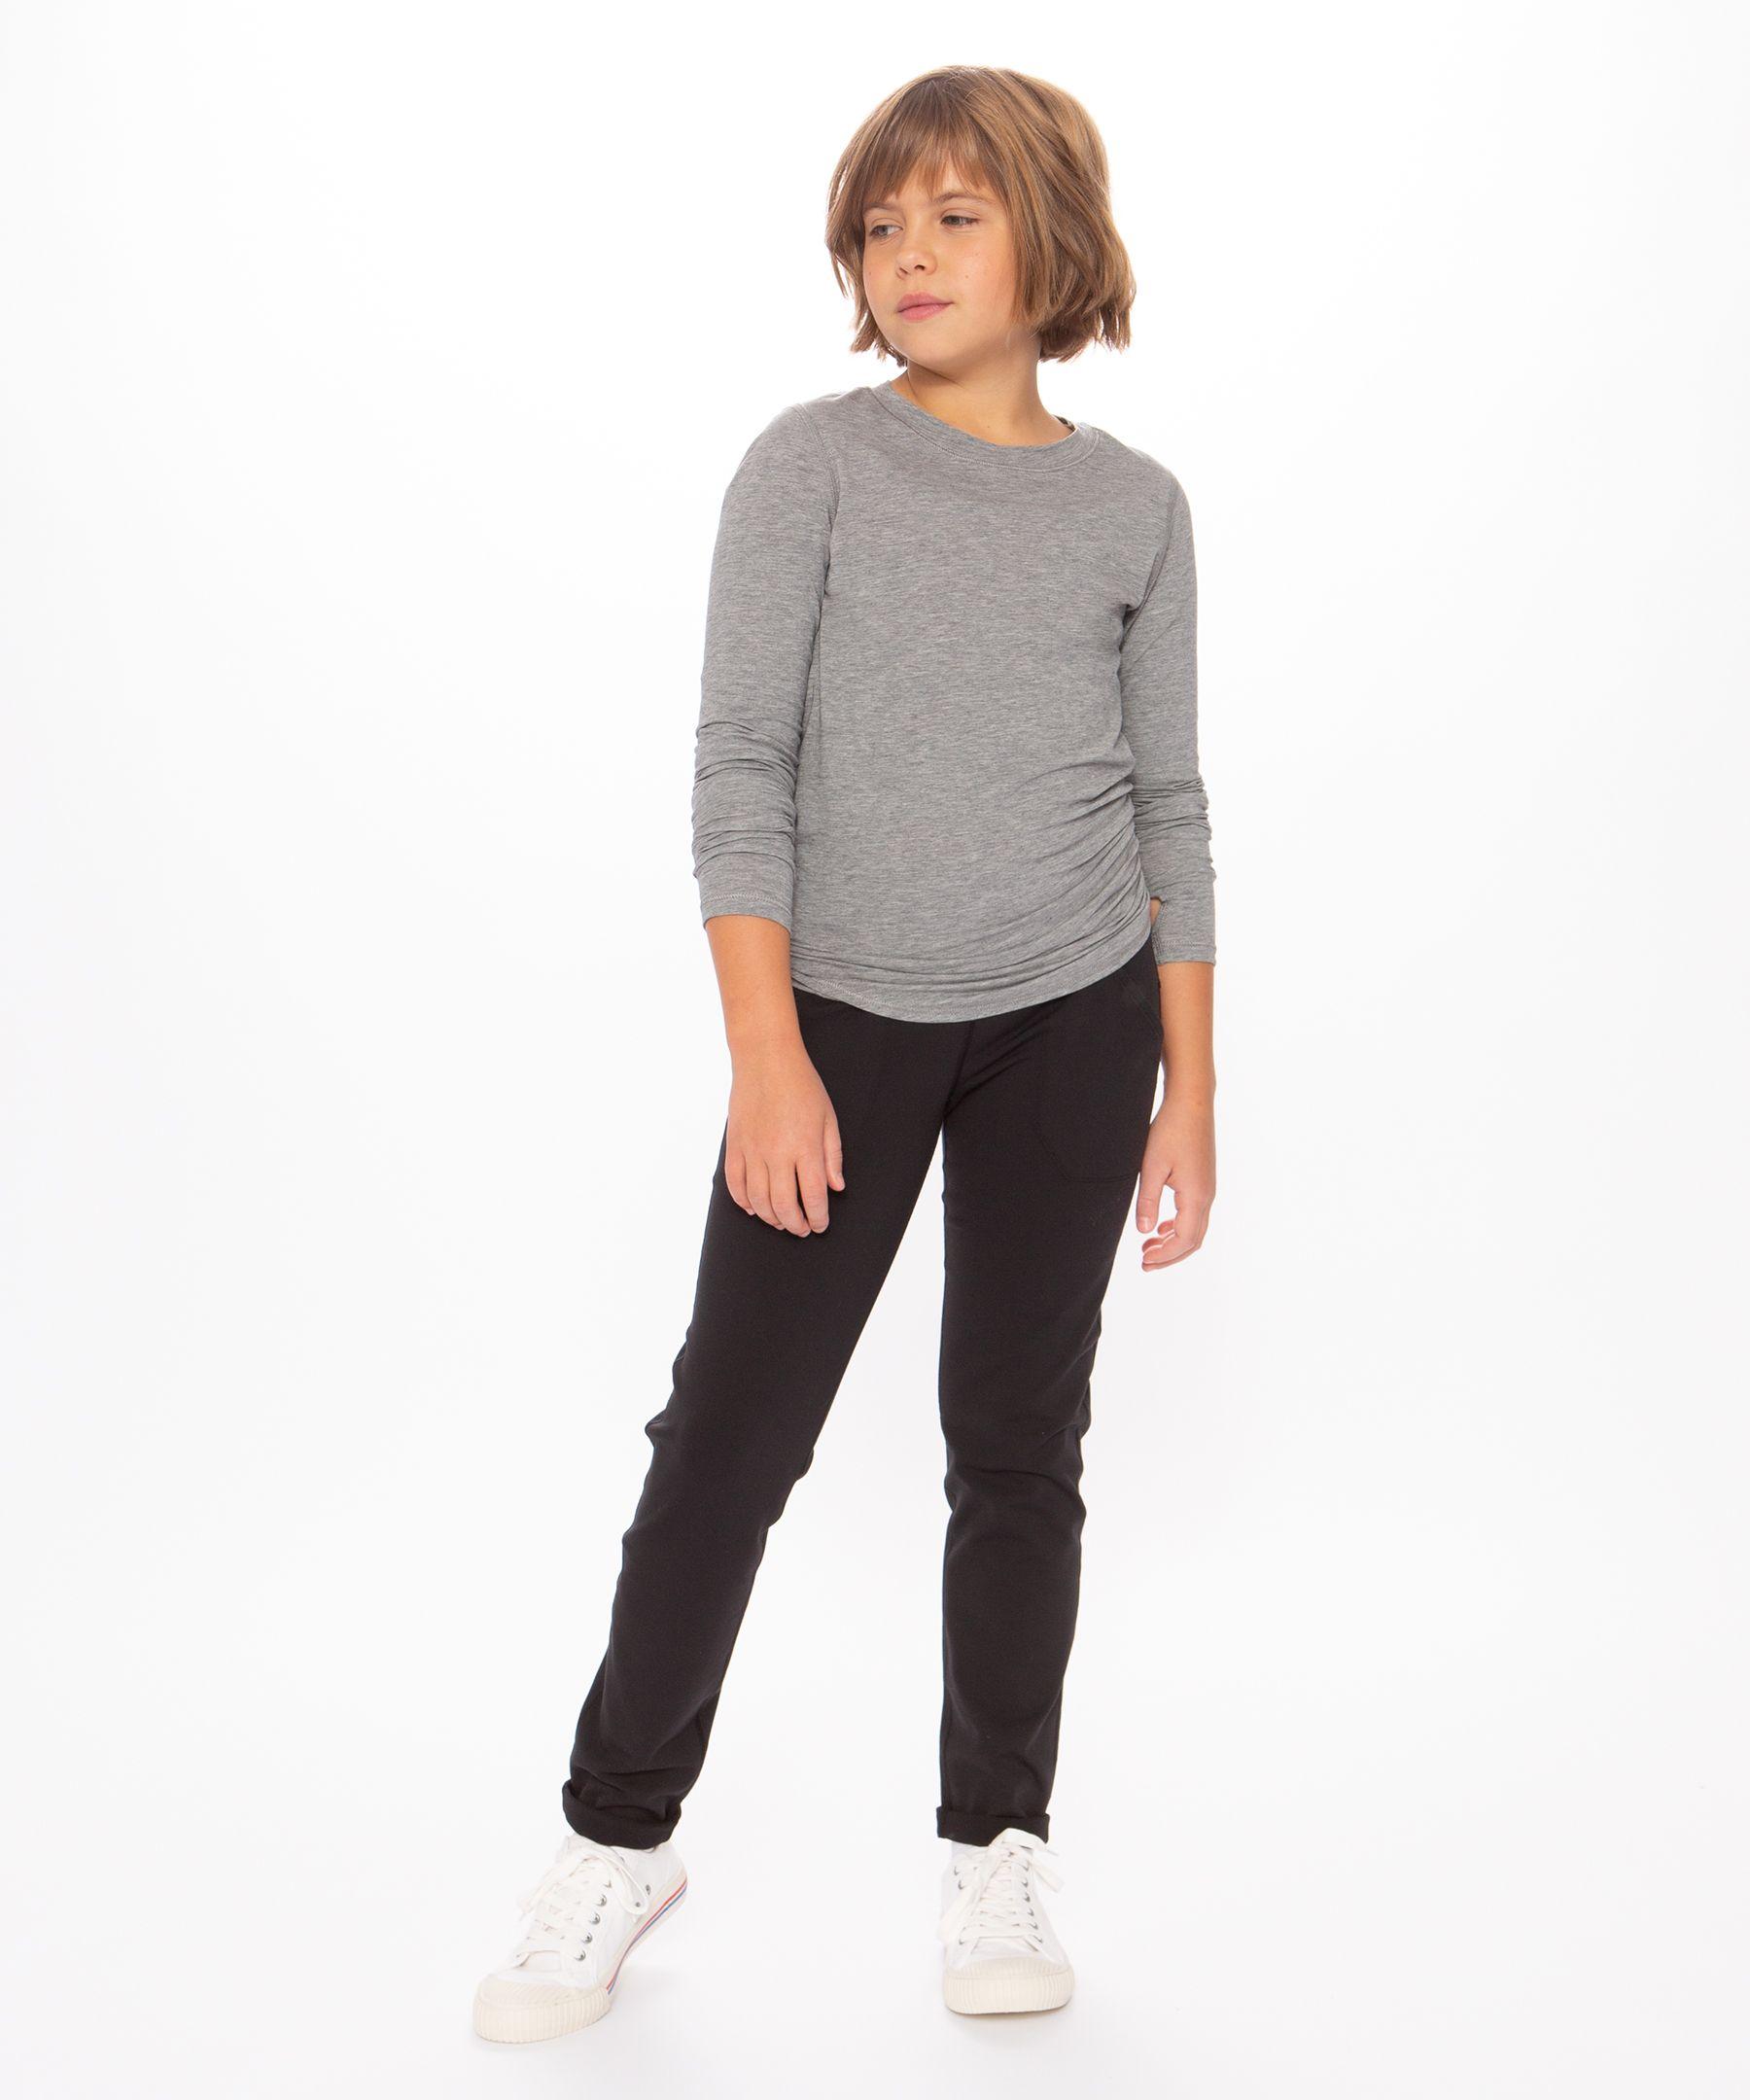 9a592808ea Calm To Energy Long Sleeve Tee | Girls' Long Sleeves | lululemon ...